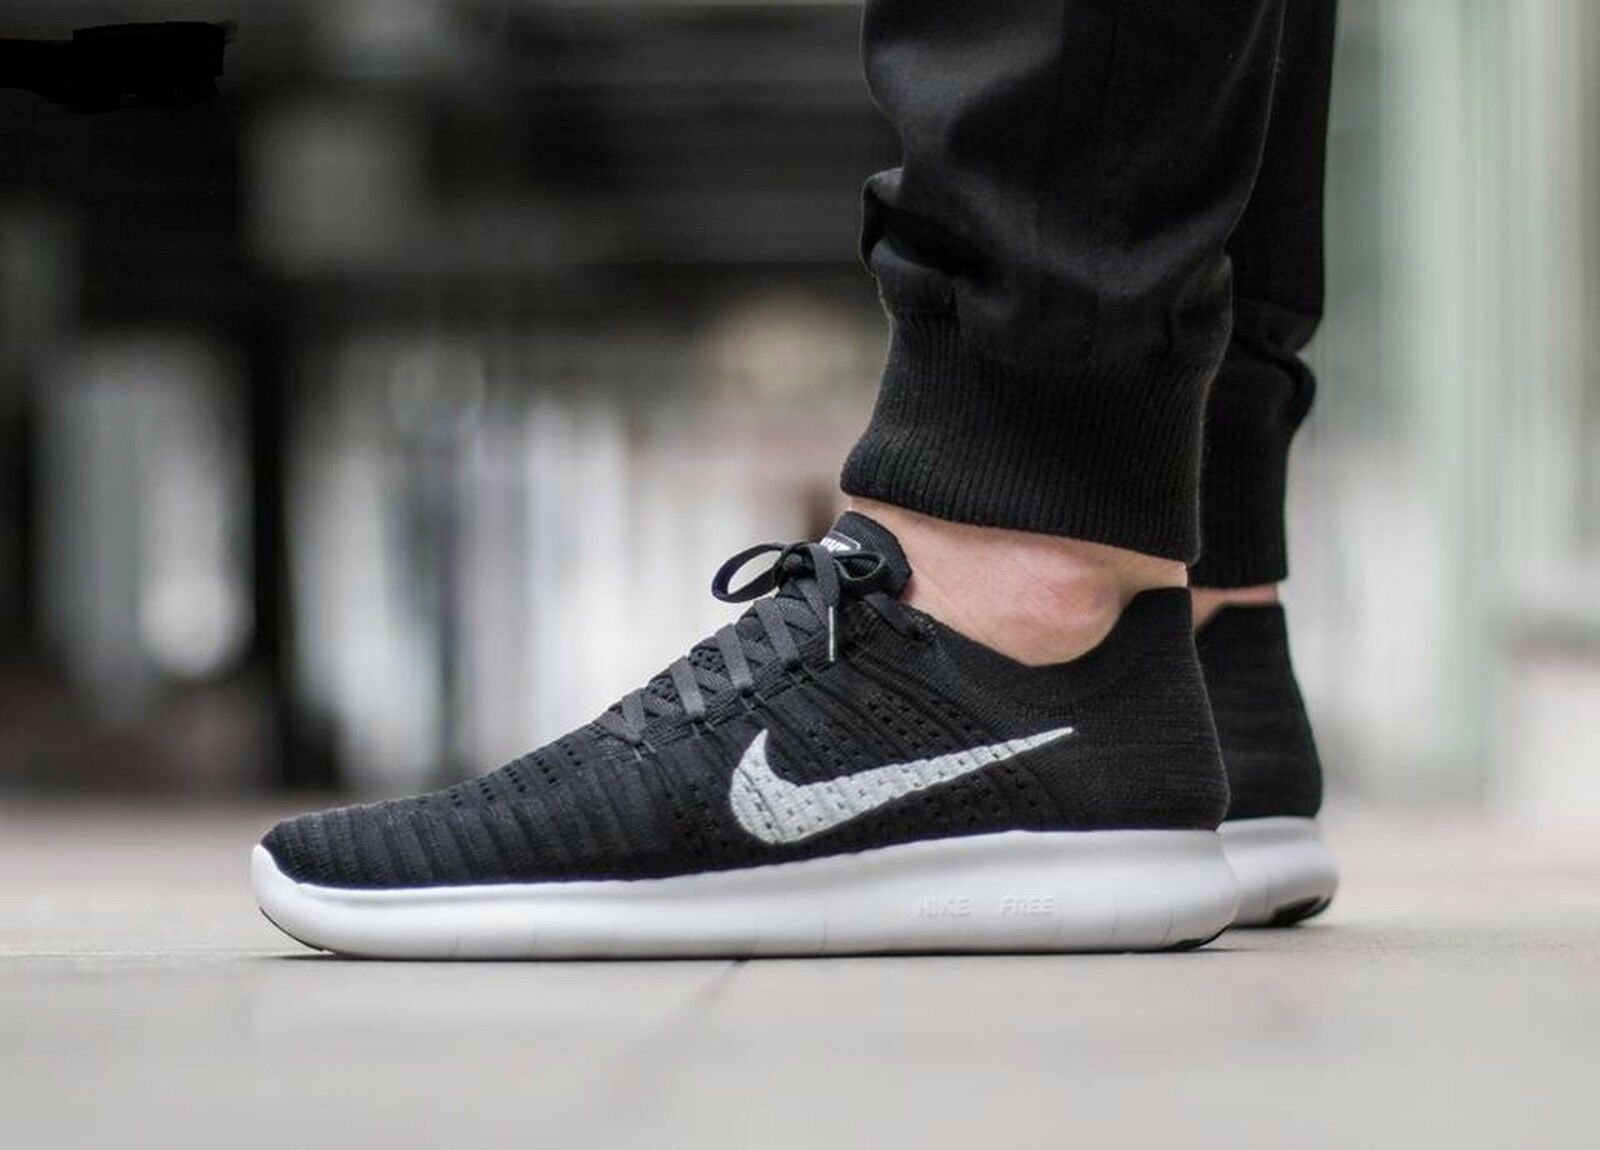 Nike libera rn flyknit scarpe bianco nero 831069 001 Uomo sz 13